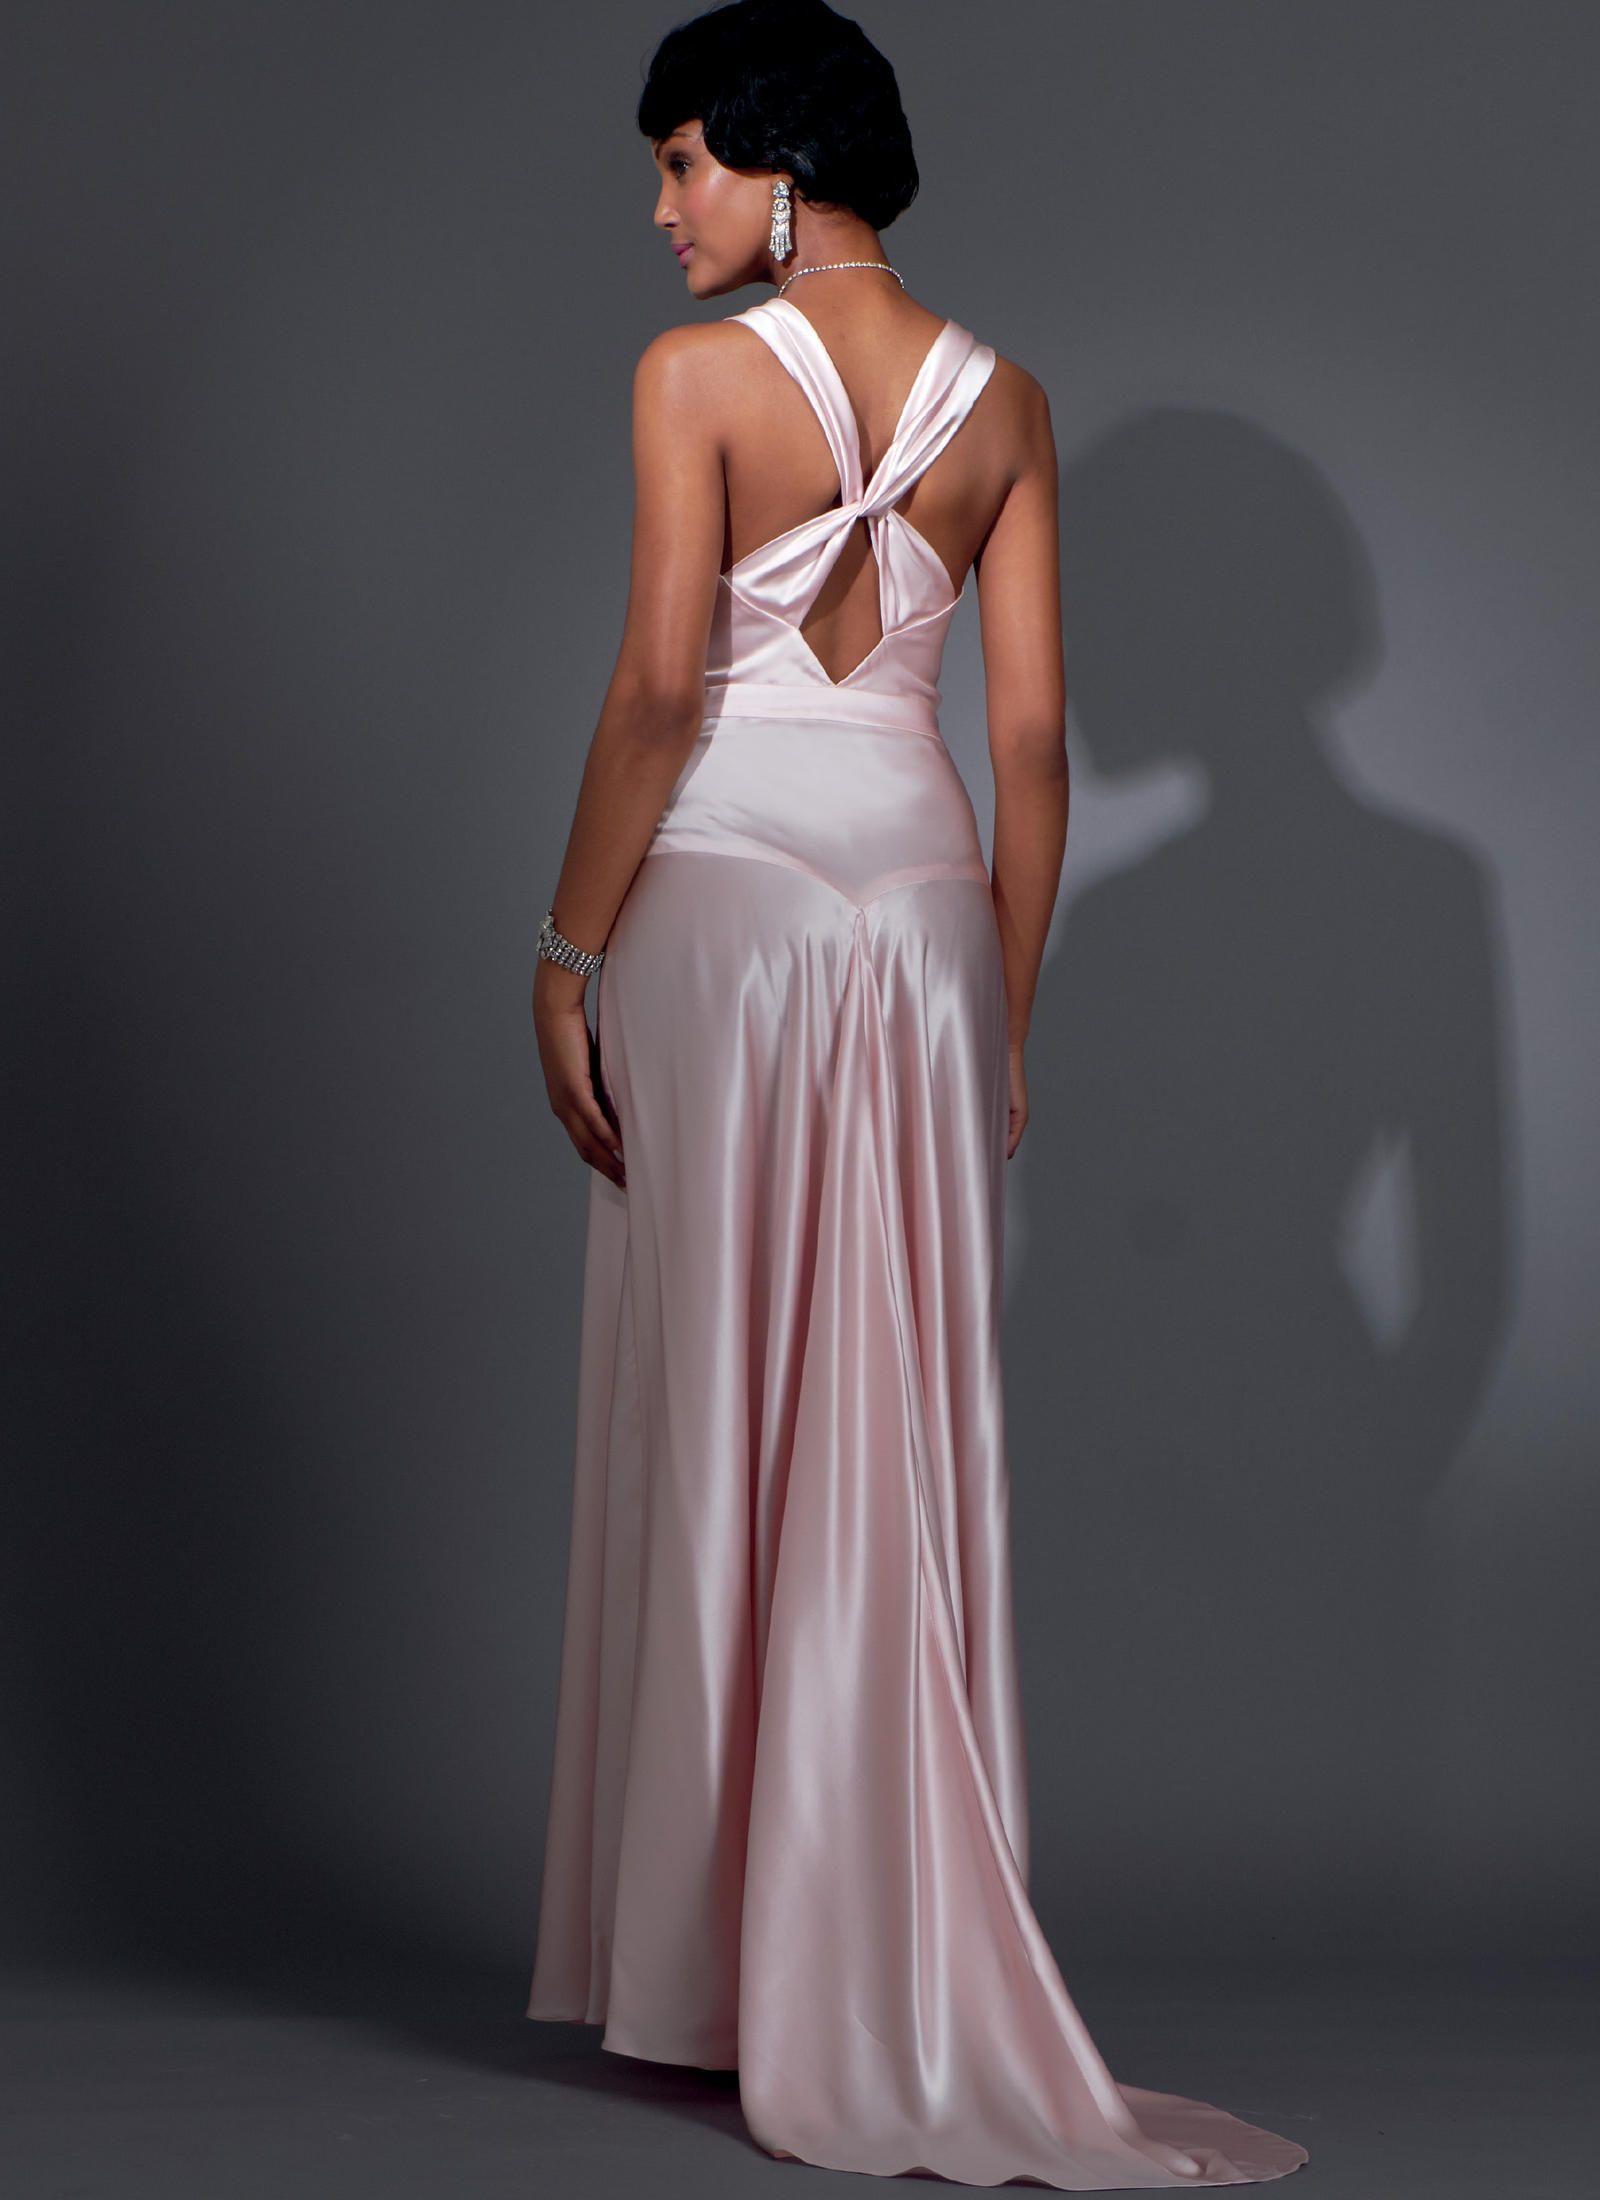 M7867 Dresses, Dress patterns, Bridal dresses